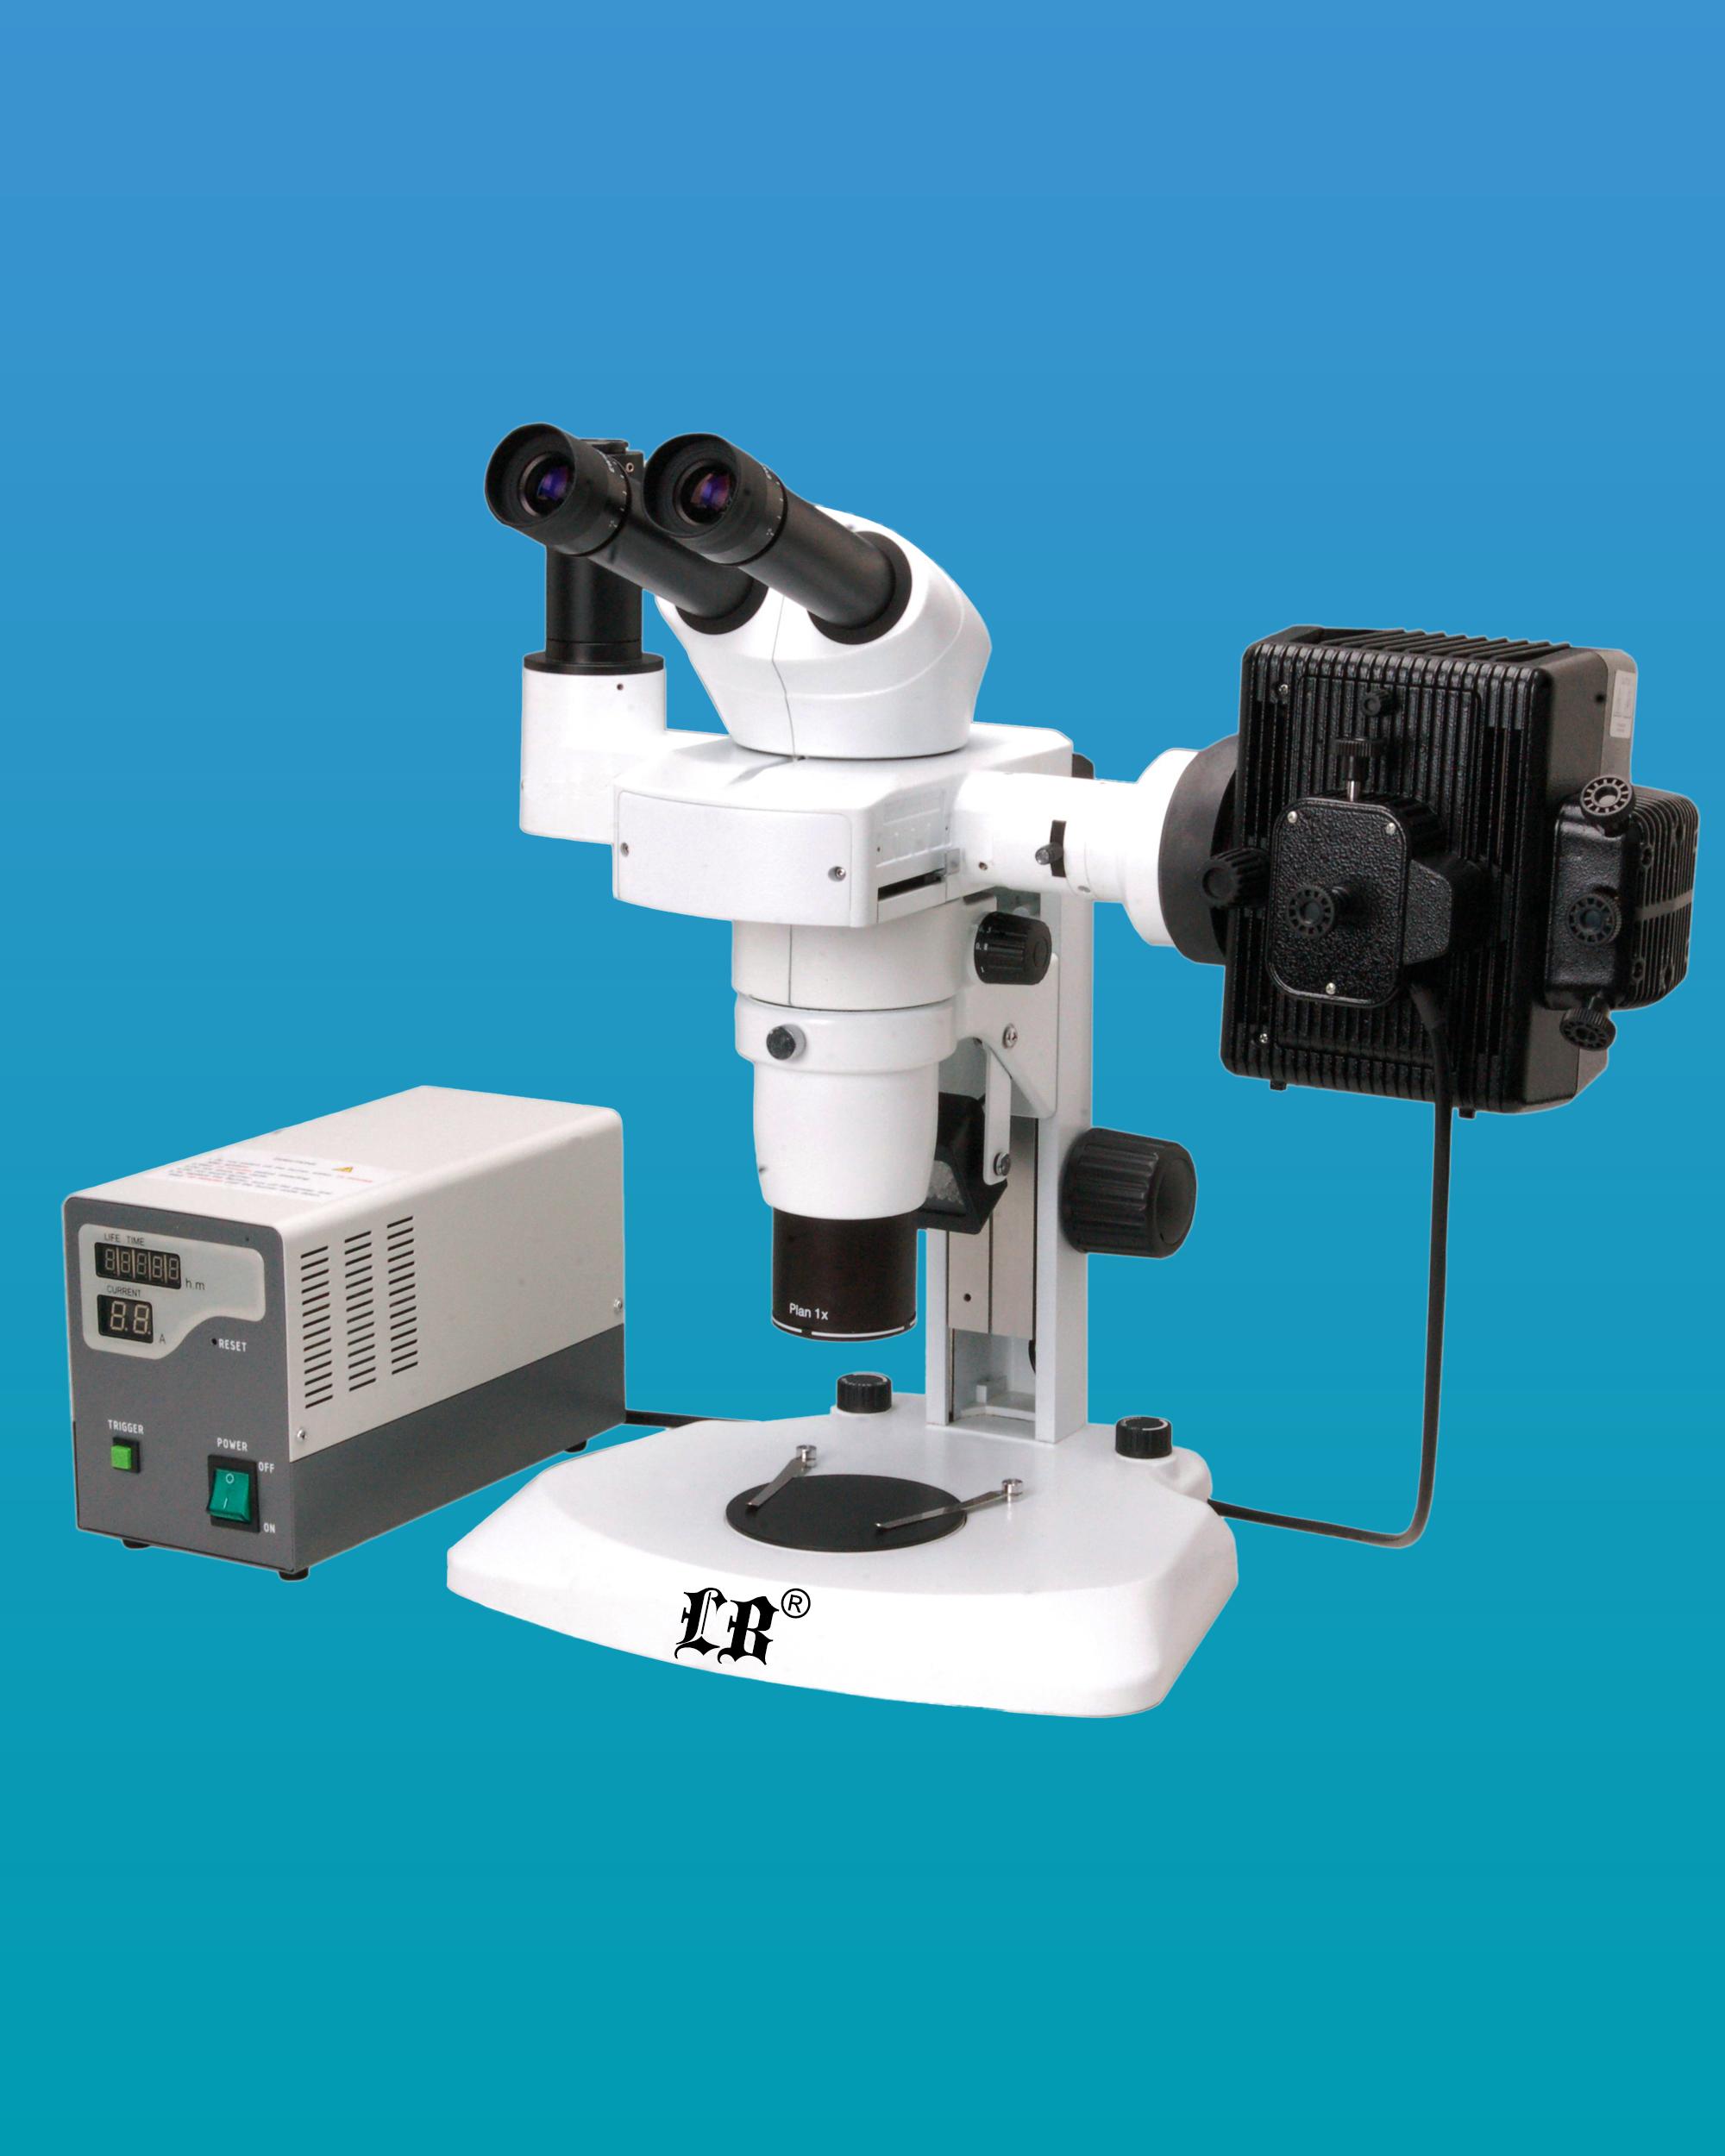 [LB-368] Binocular Zoom Fluorescent Stereo Microscope w/ Infinite Parallel Zoom Optical System & LED Illumination